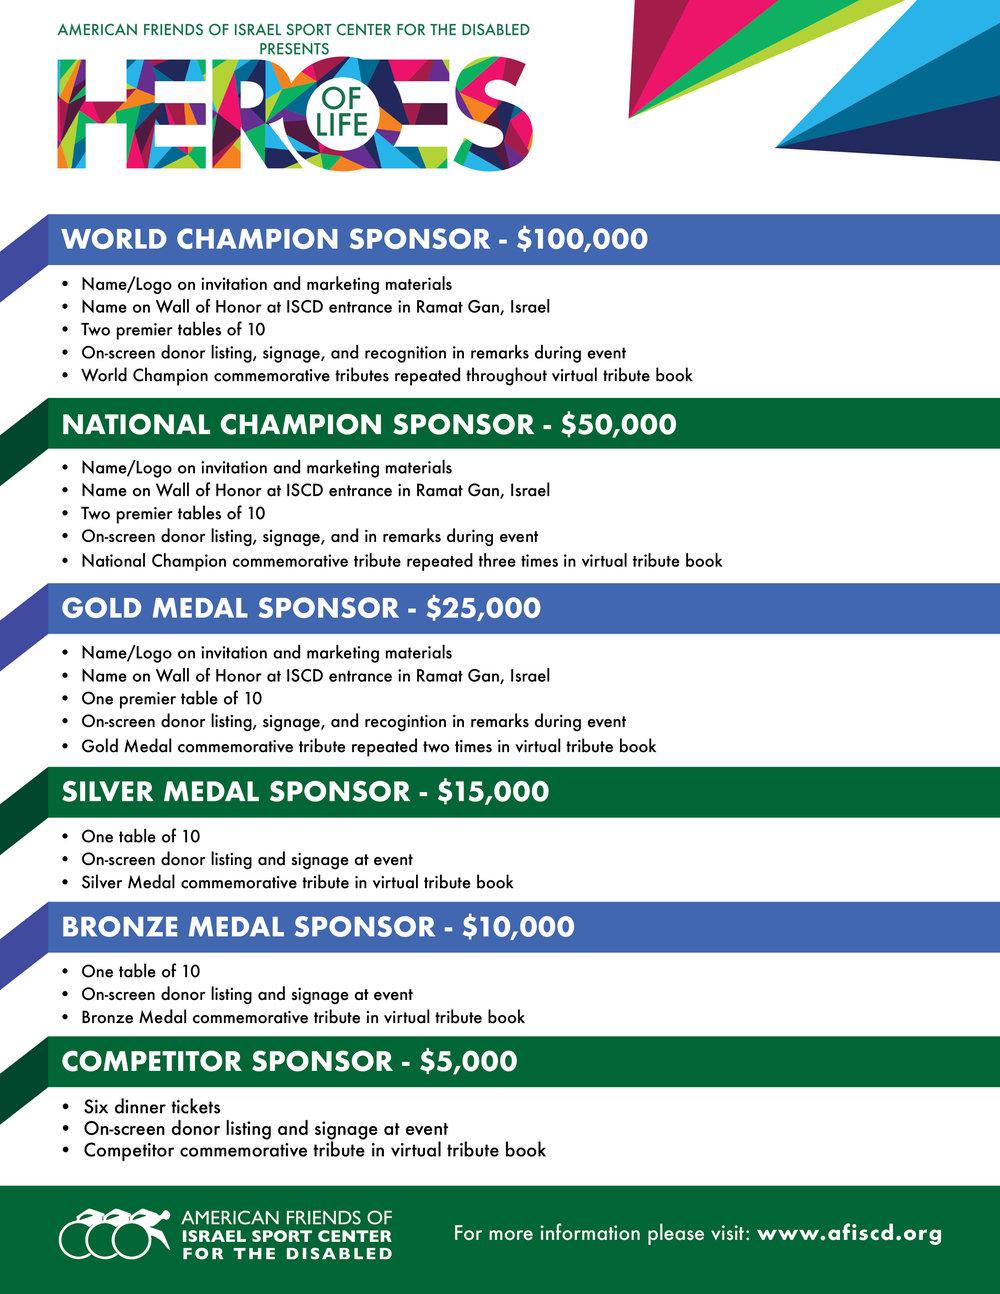 2018 ISCD-Gala-Sponsorship Deck-v2a.jpg